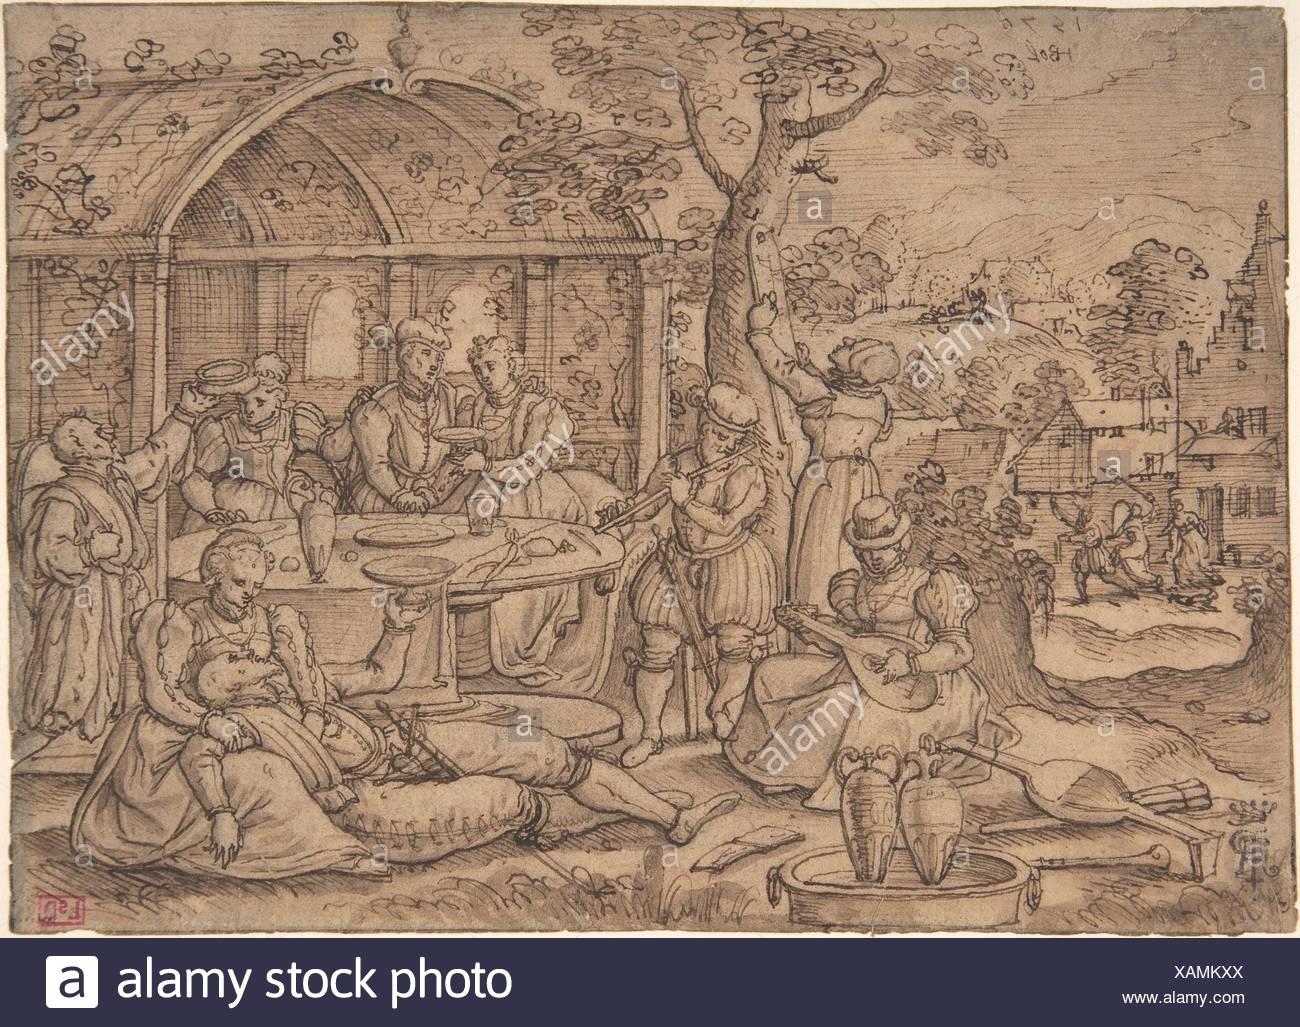 Artist: Hans Bol (Netherlandish, Mechelen 1534-1593 Amsterdam); Date: 1570;  Medium: Pen and brown ink, brown wash; Dimensions: 5